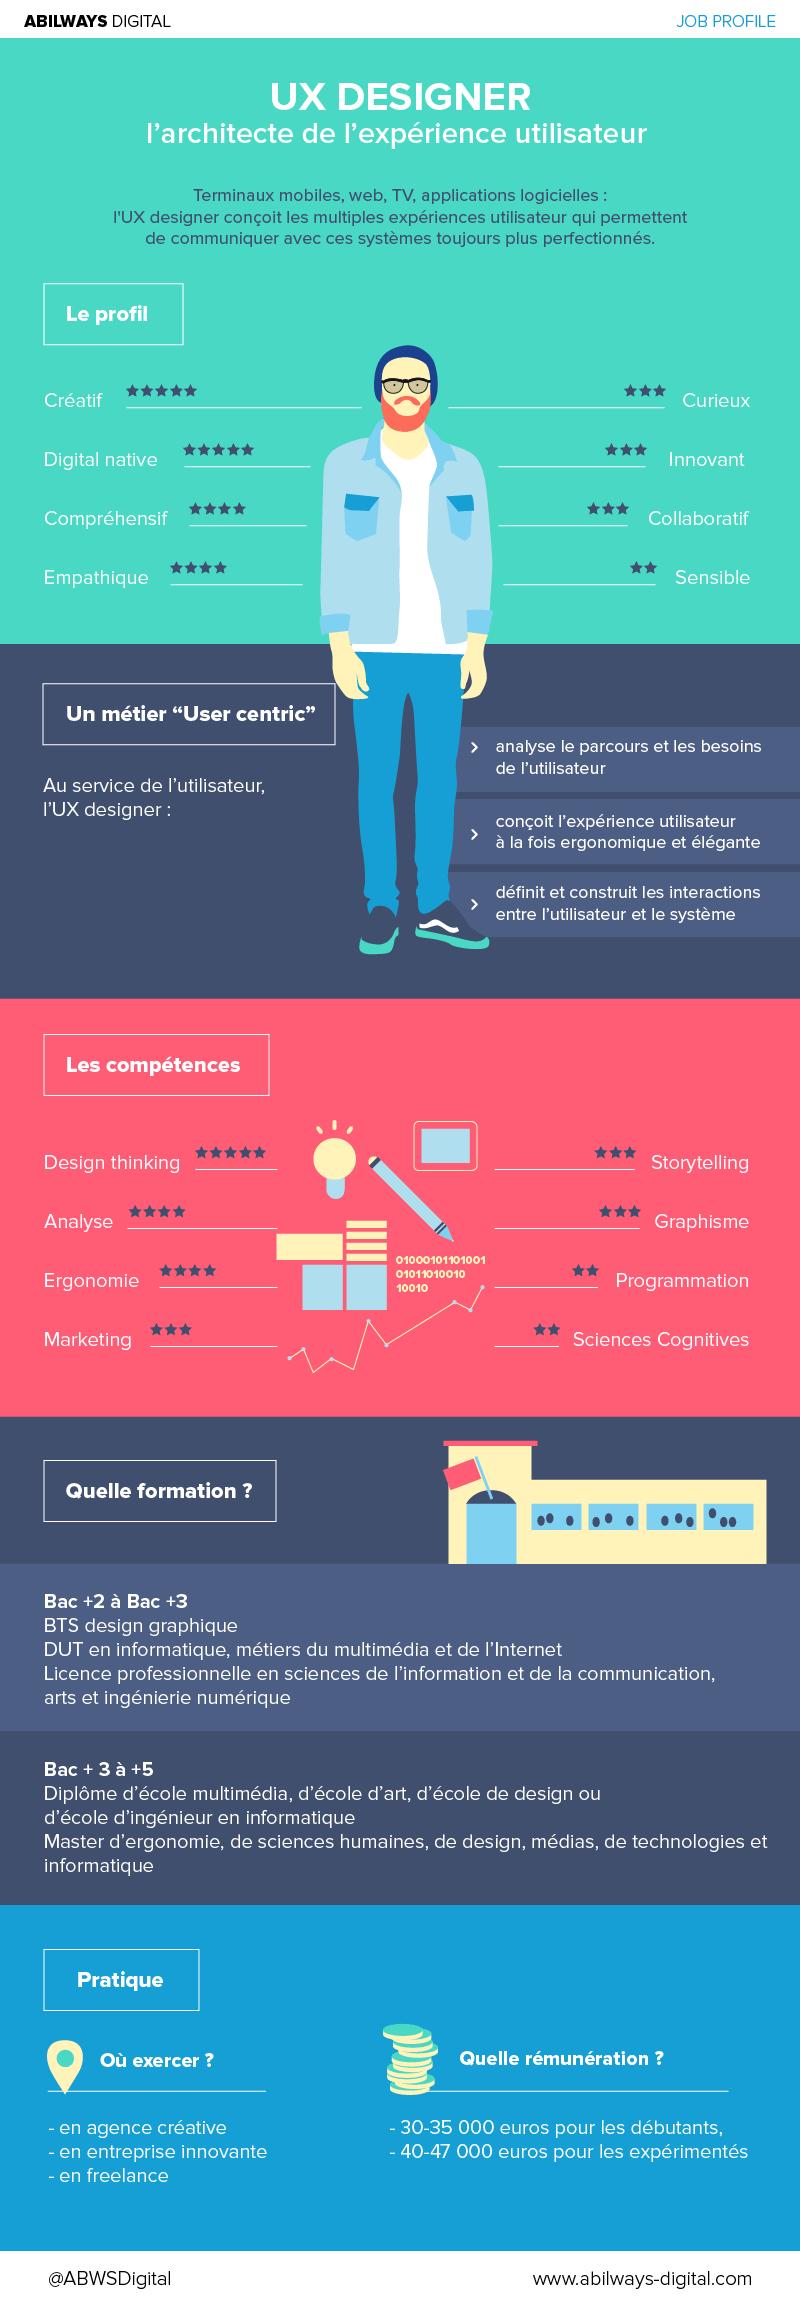 infographie job profile   ux designer   l u2019architecte de l u2019exp u00e9rience utilisateur